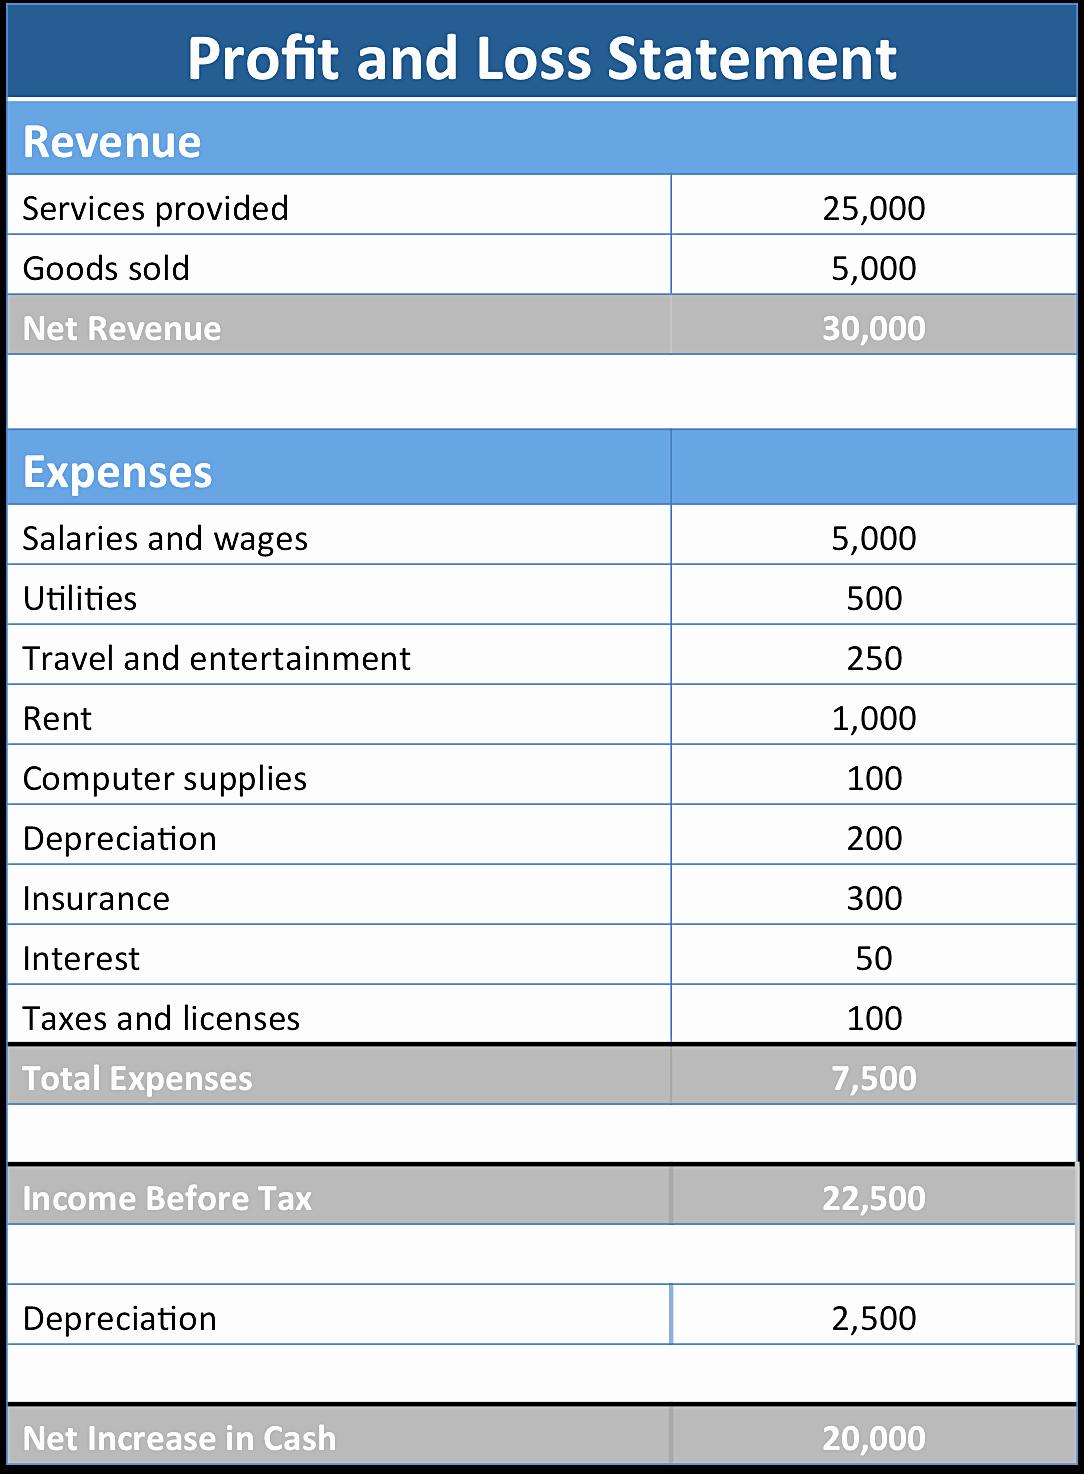 Basic Profit and Loss Statement Fresh Basic Profit and Loss Statement Template Mughals